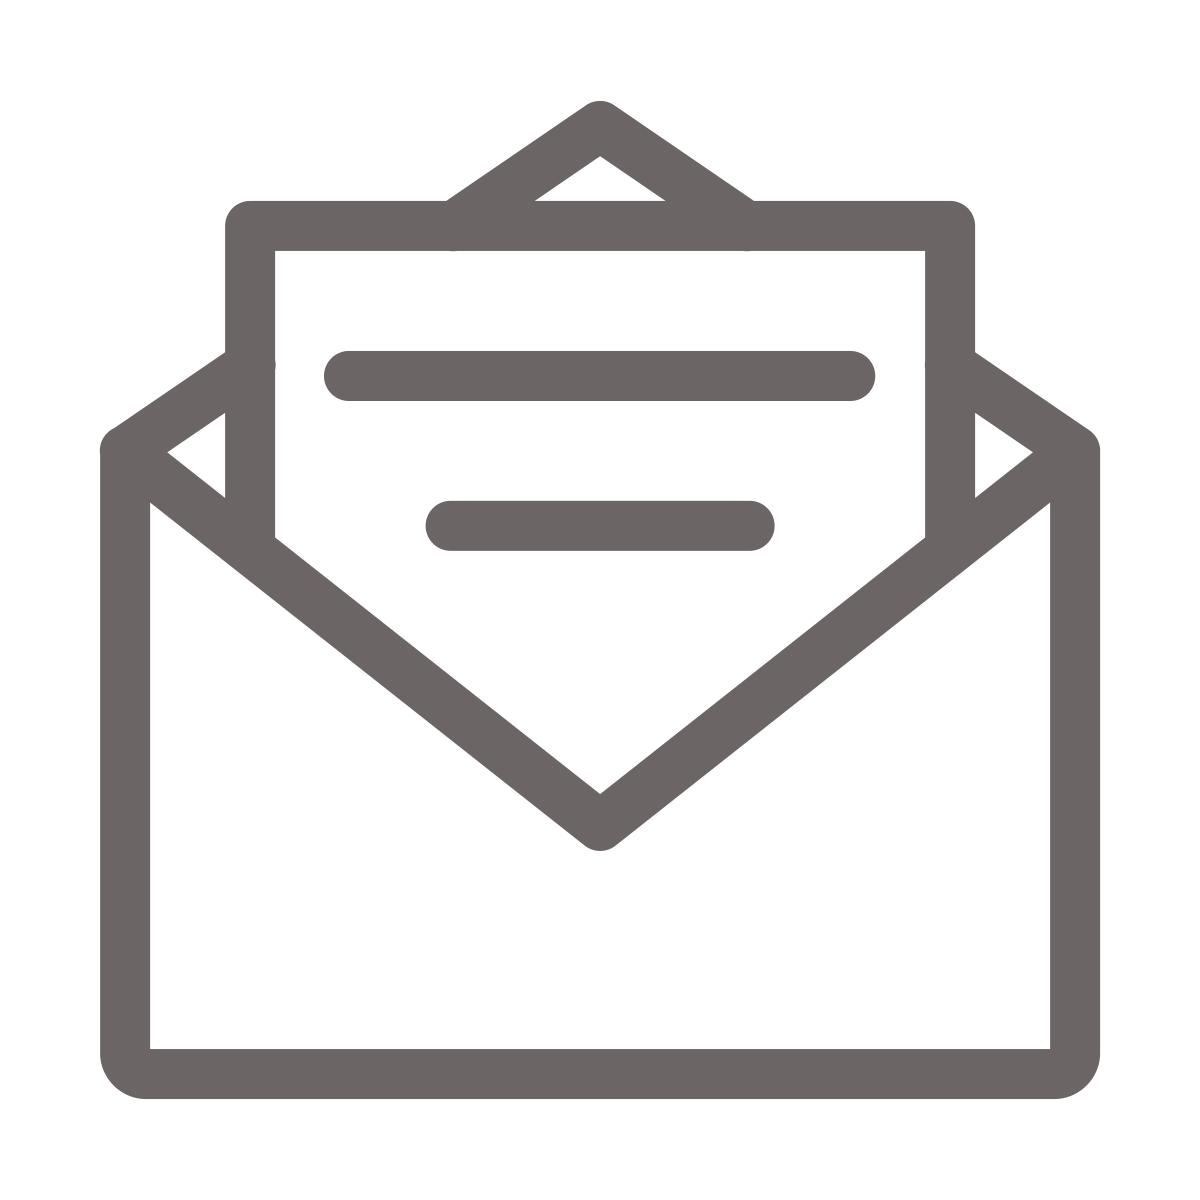 noun_Email_1950198_6b6565.png